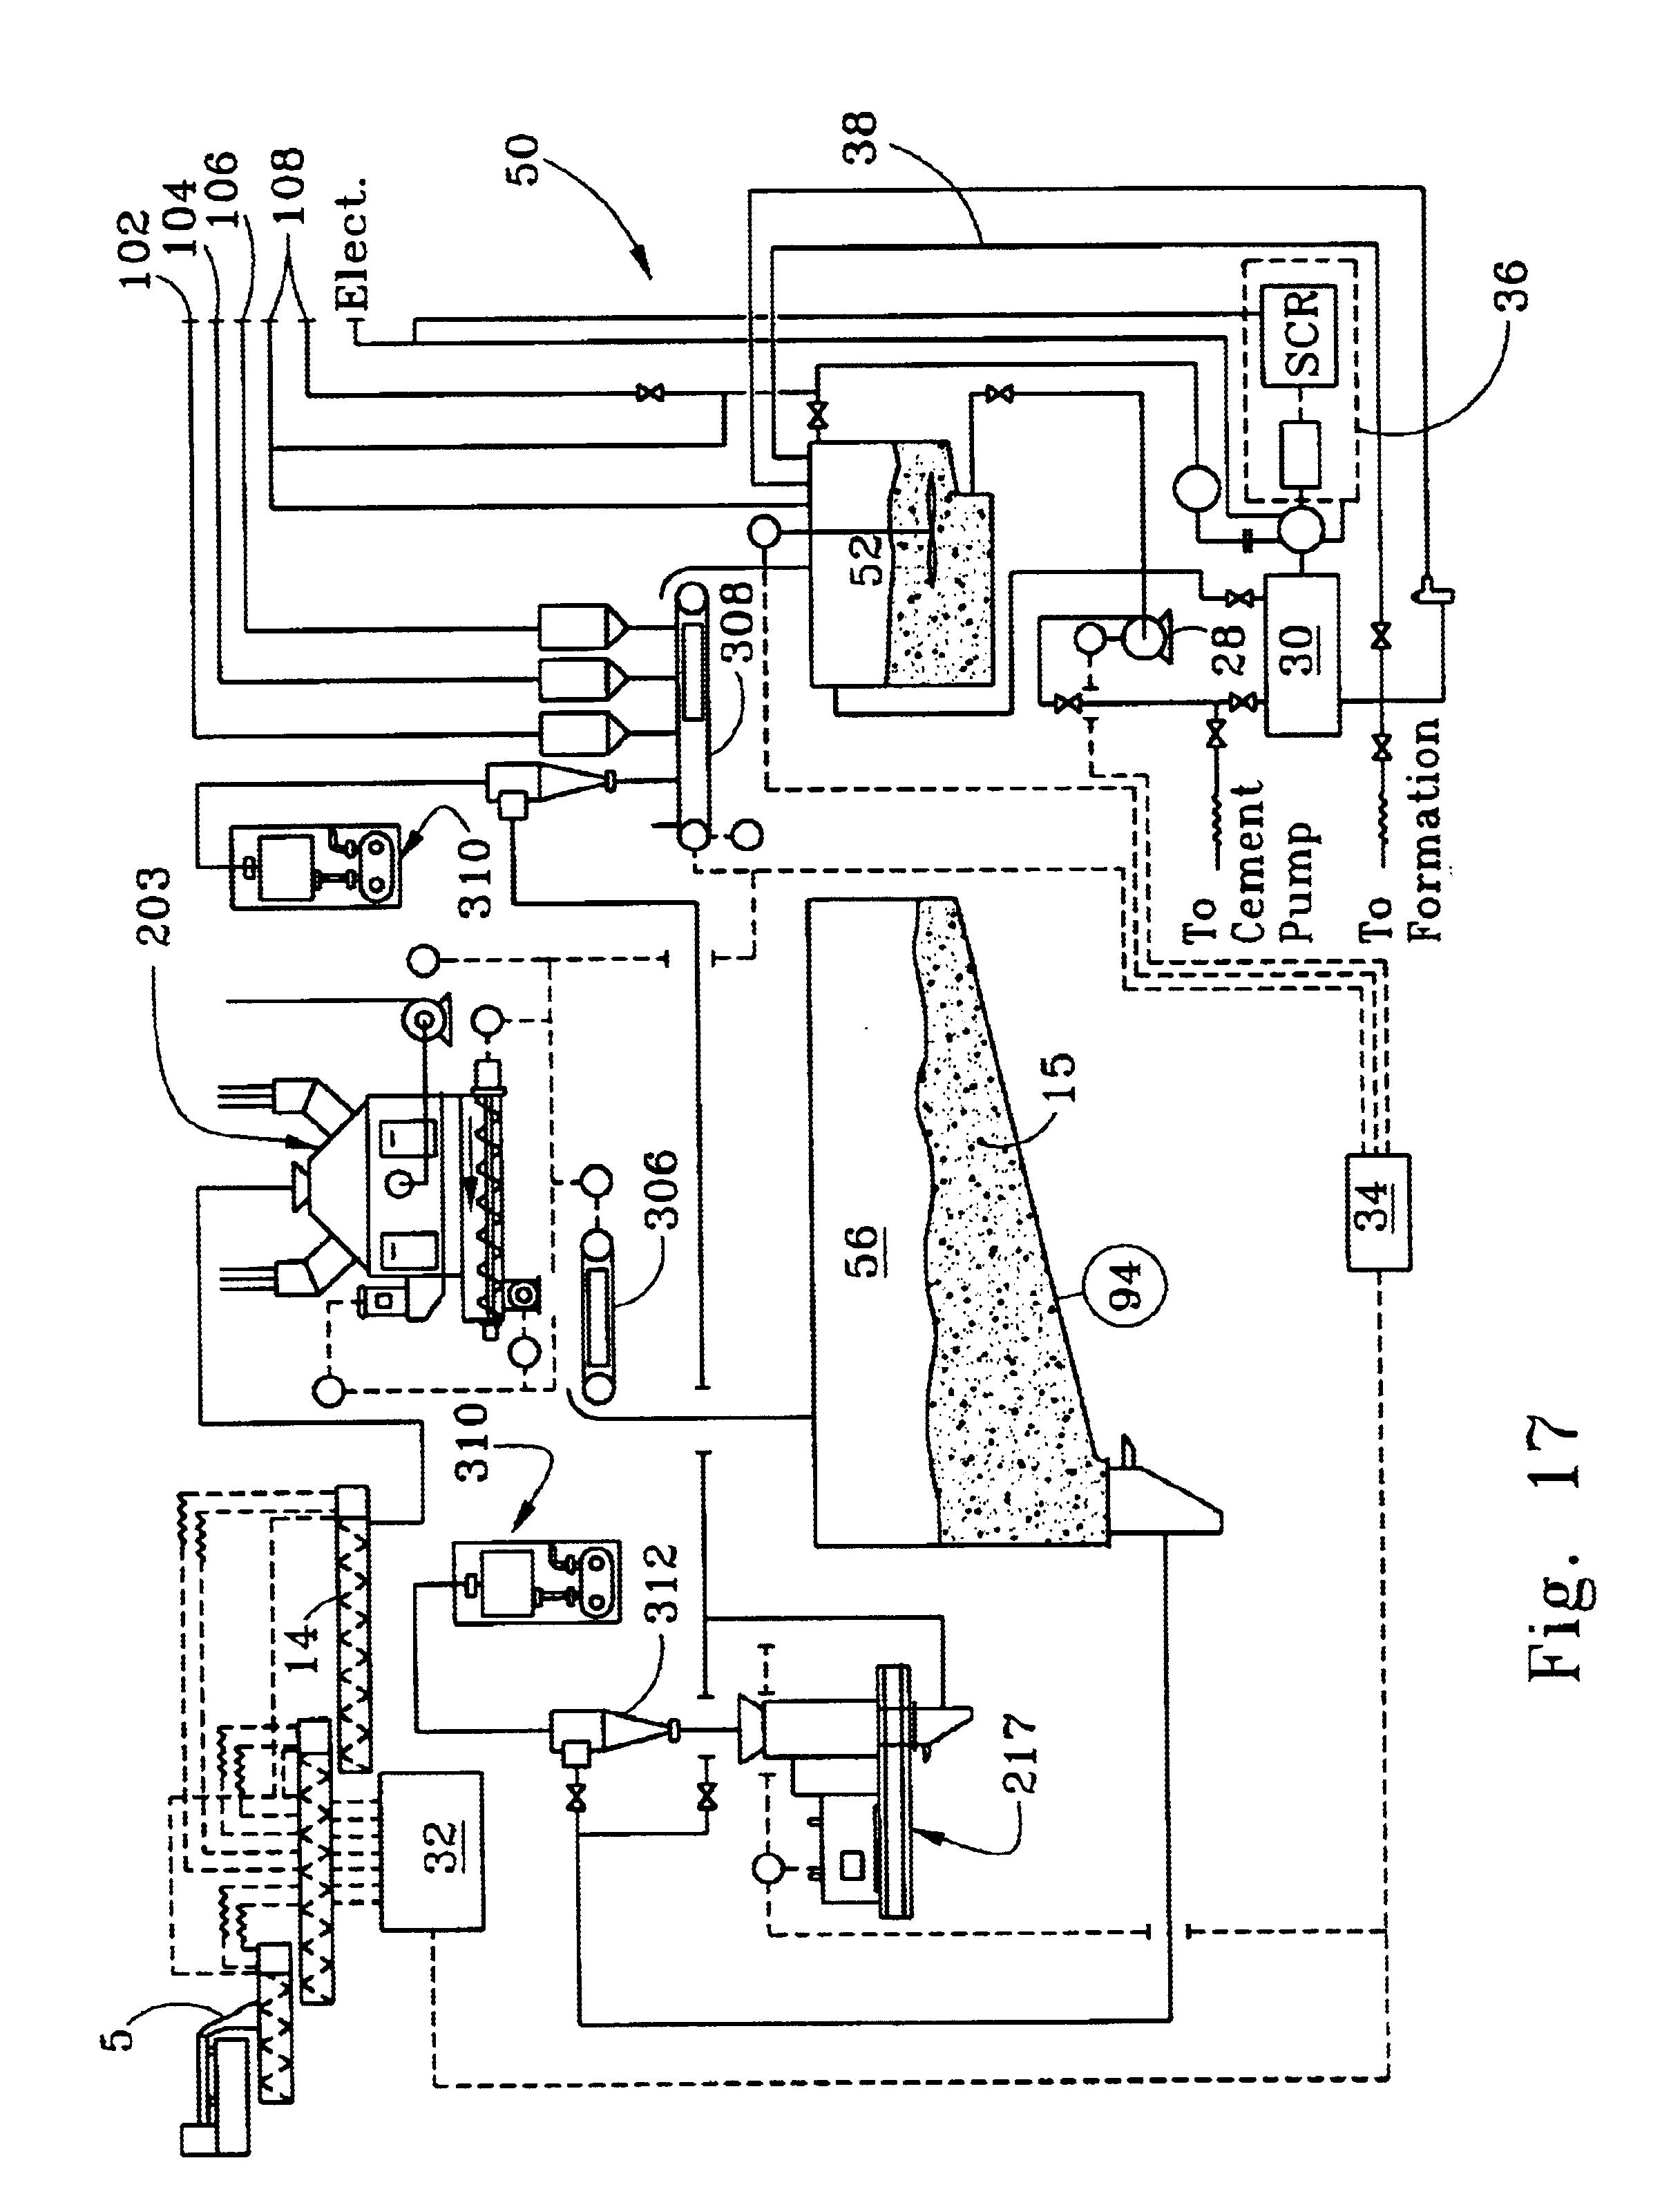 Hoover Apollo 412 Dryer Manual Daihatsu Charade Workshop Free Download